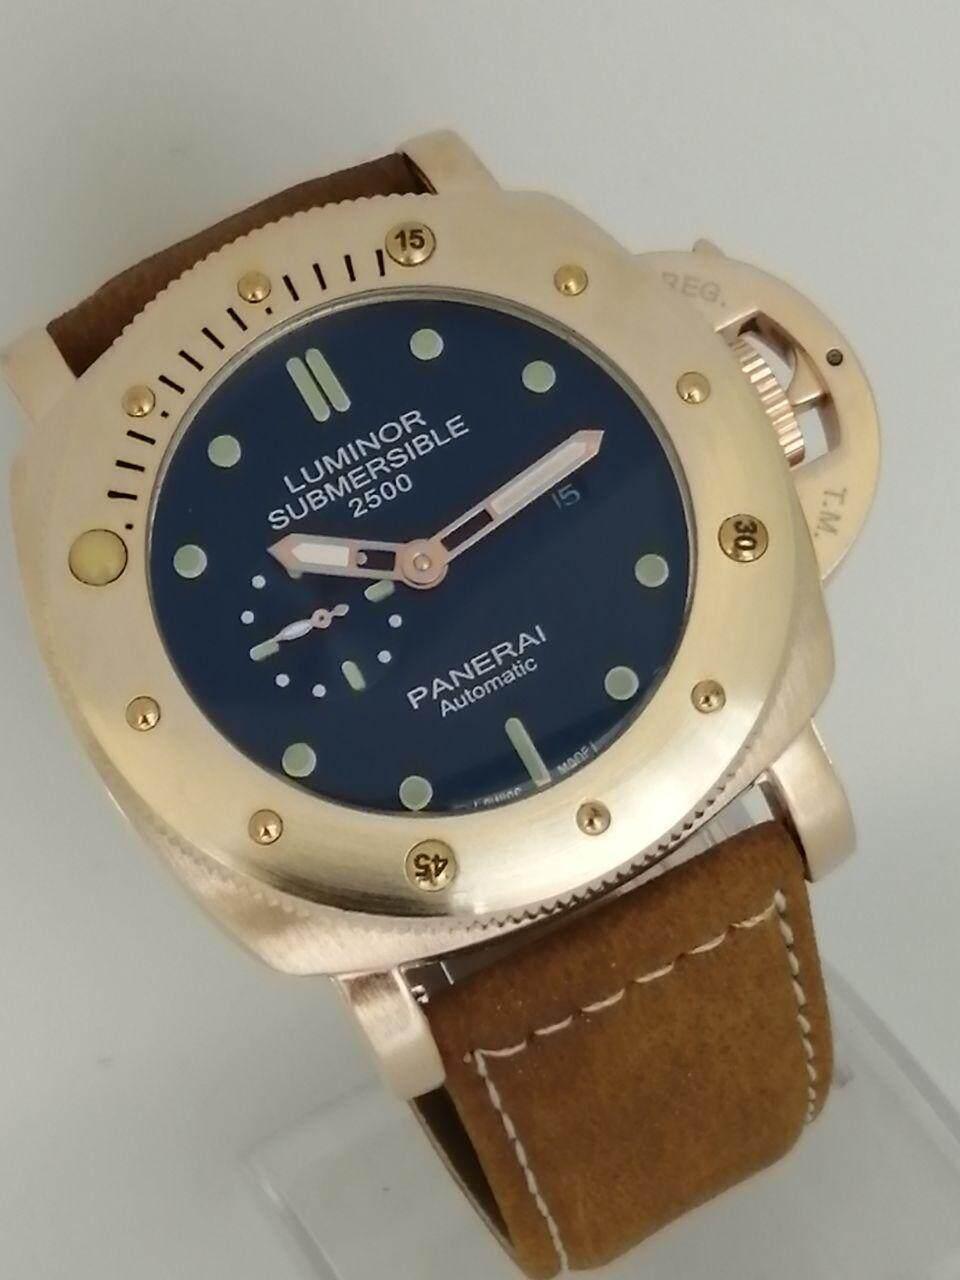 Penarae Automatic Watch ( 14 days moneyback guarantee )